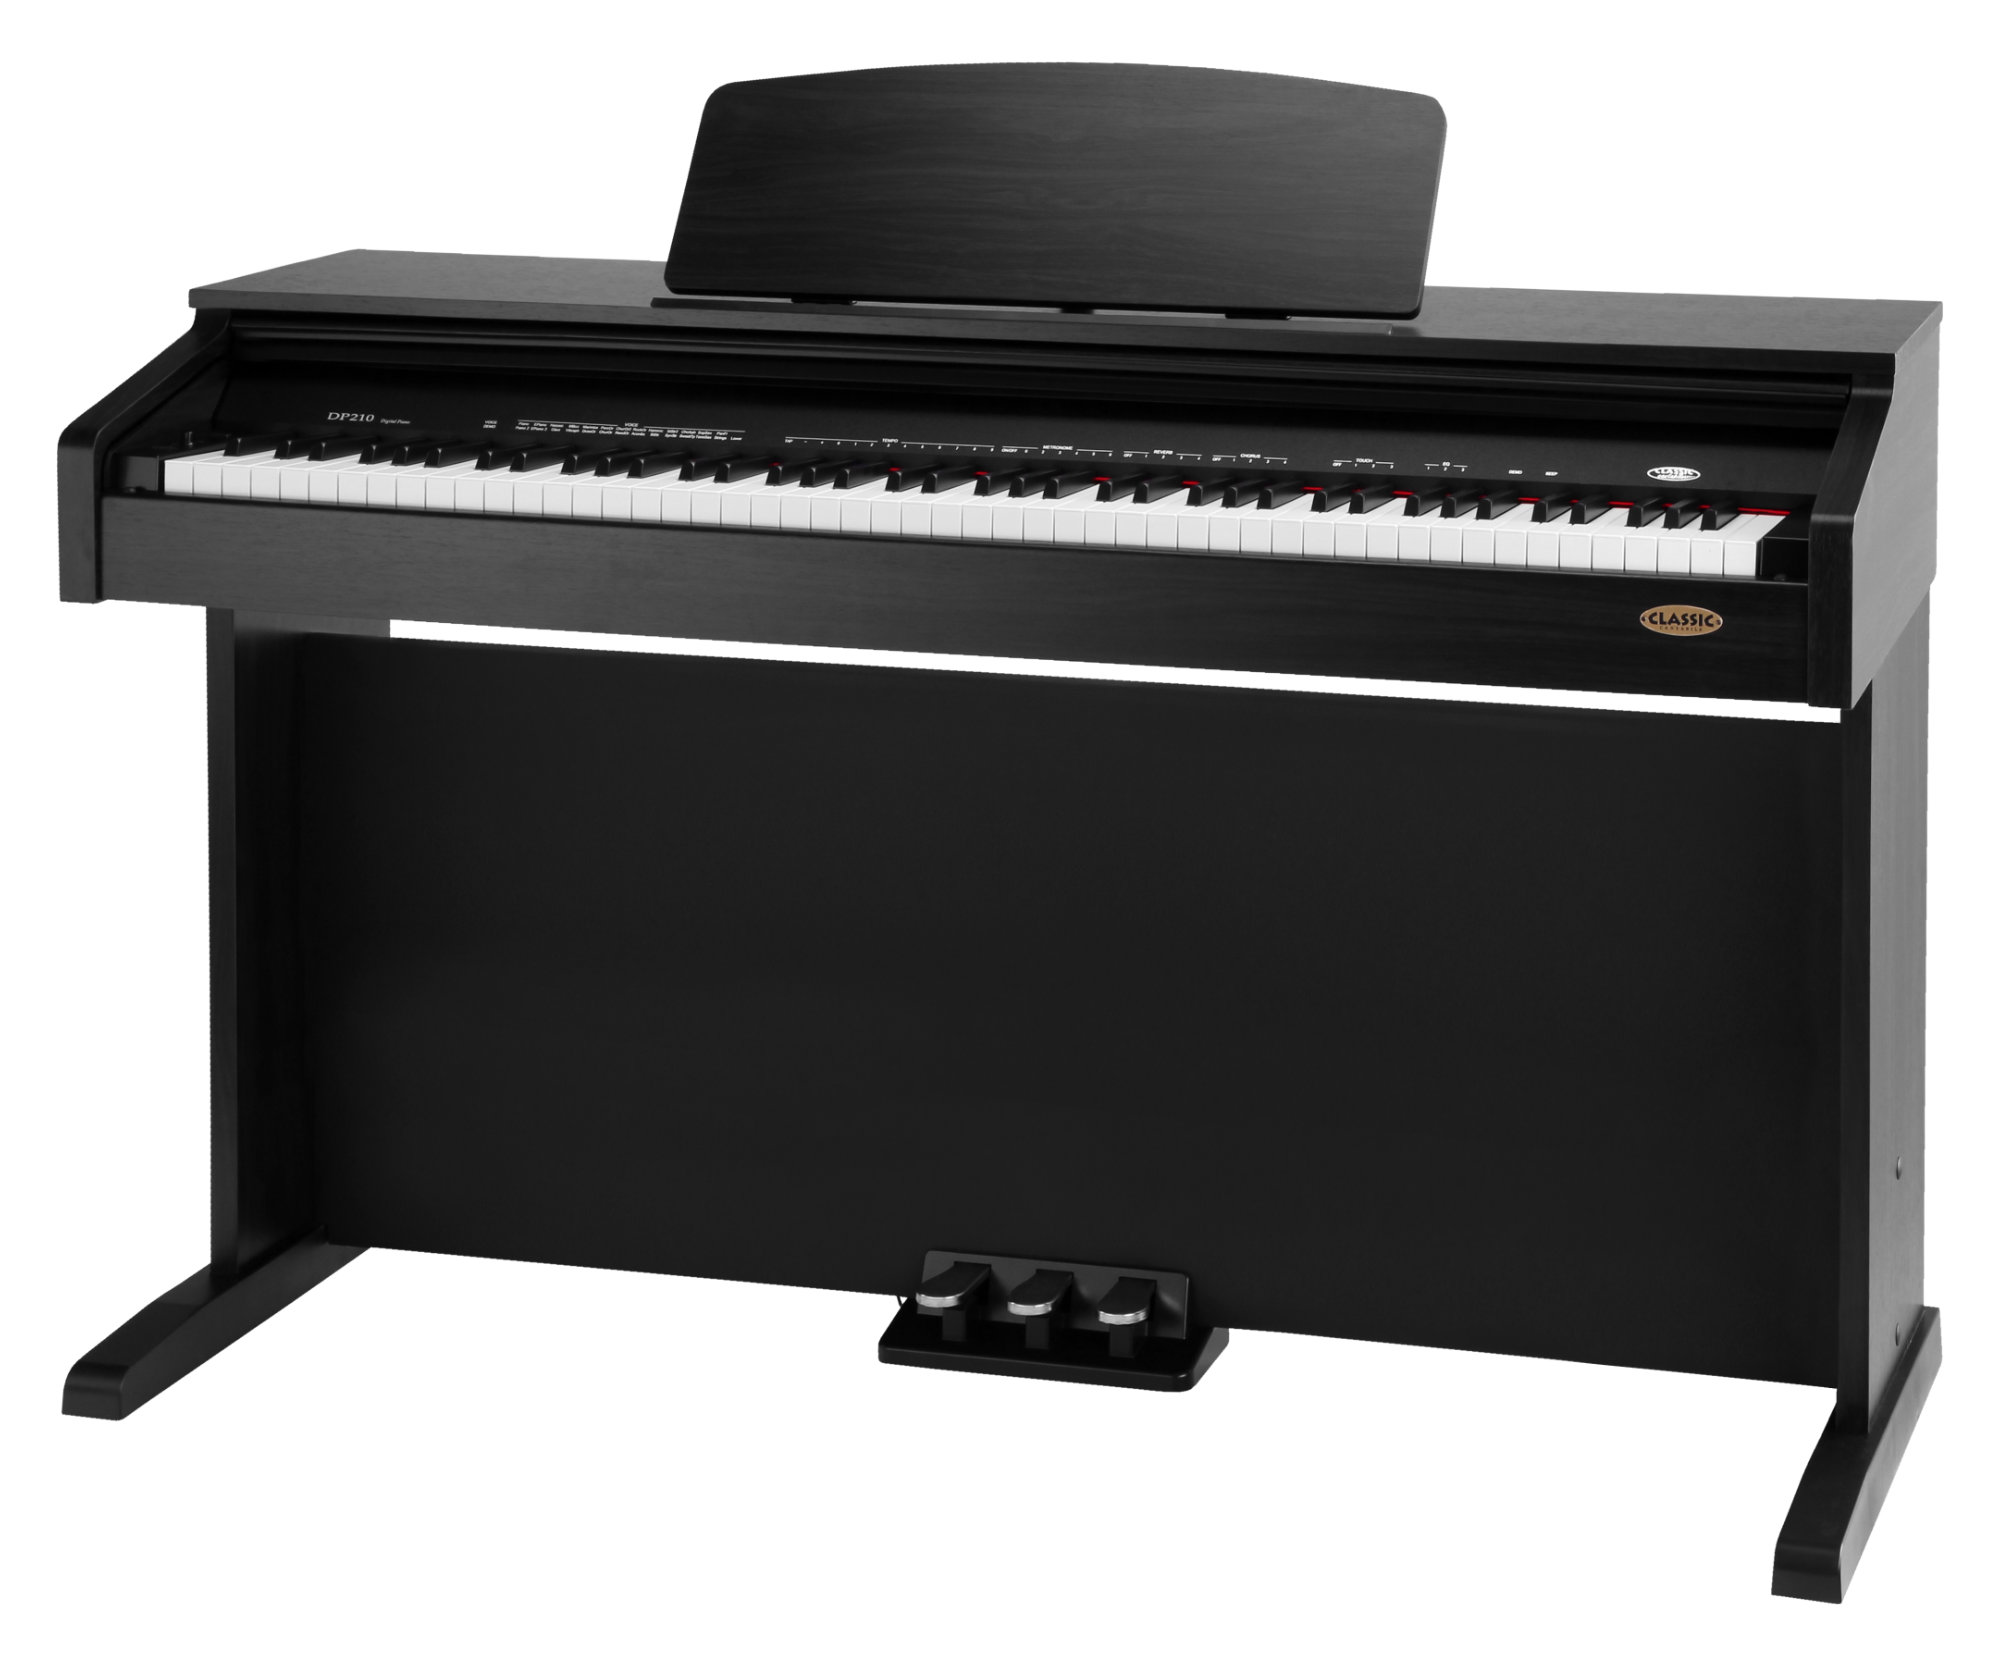 Classic Cantabile DP 210 SM E Piano schwarz matt